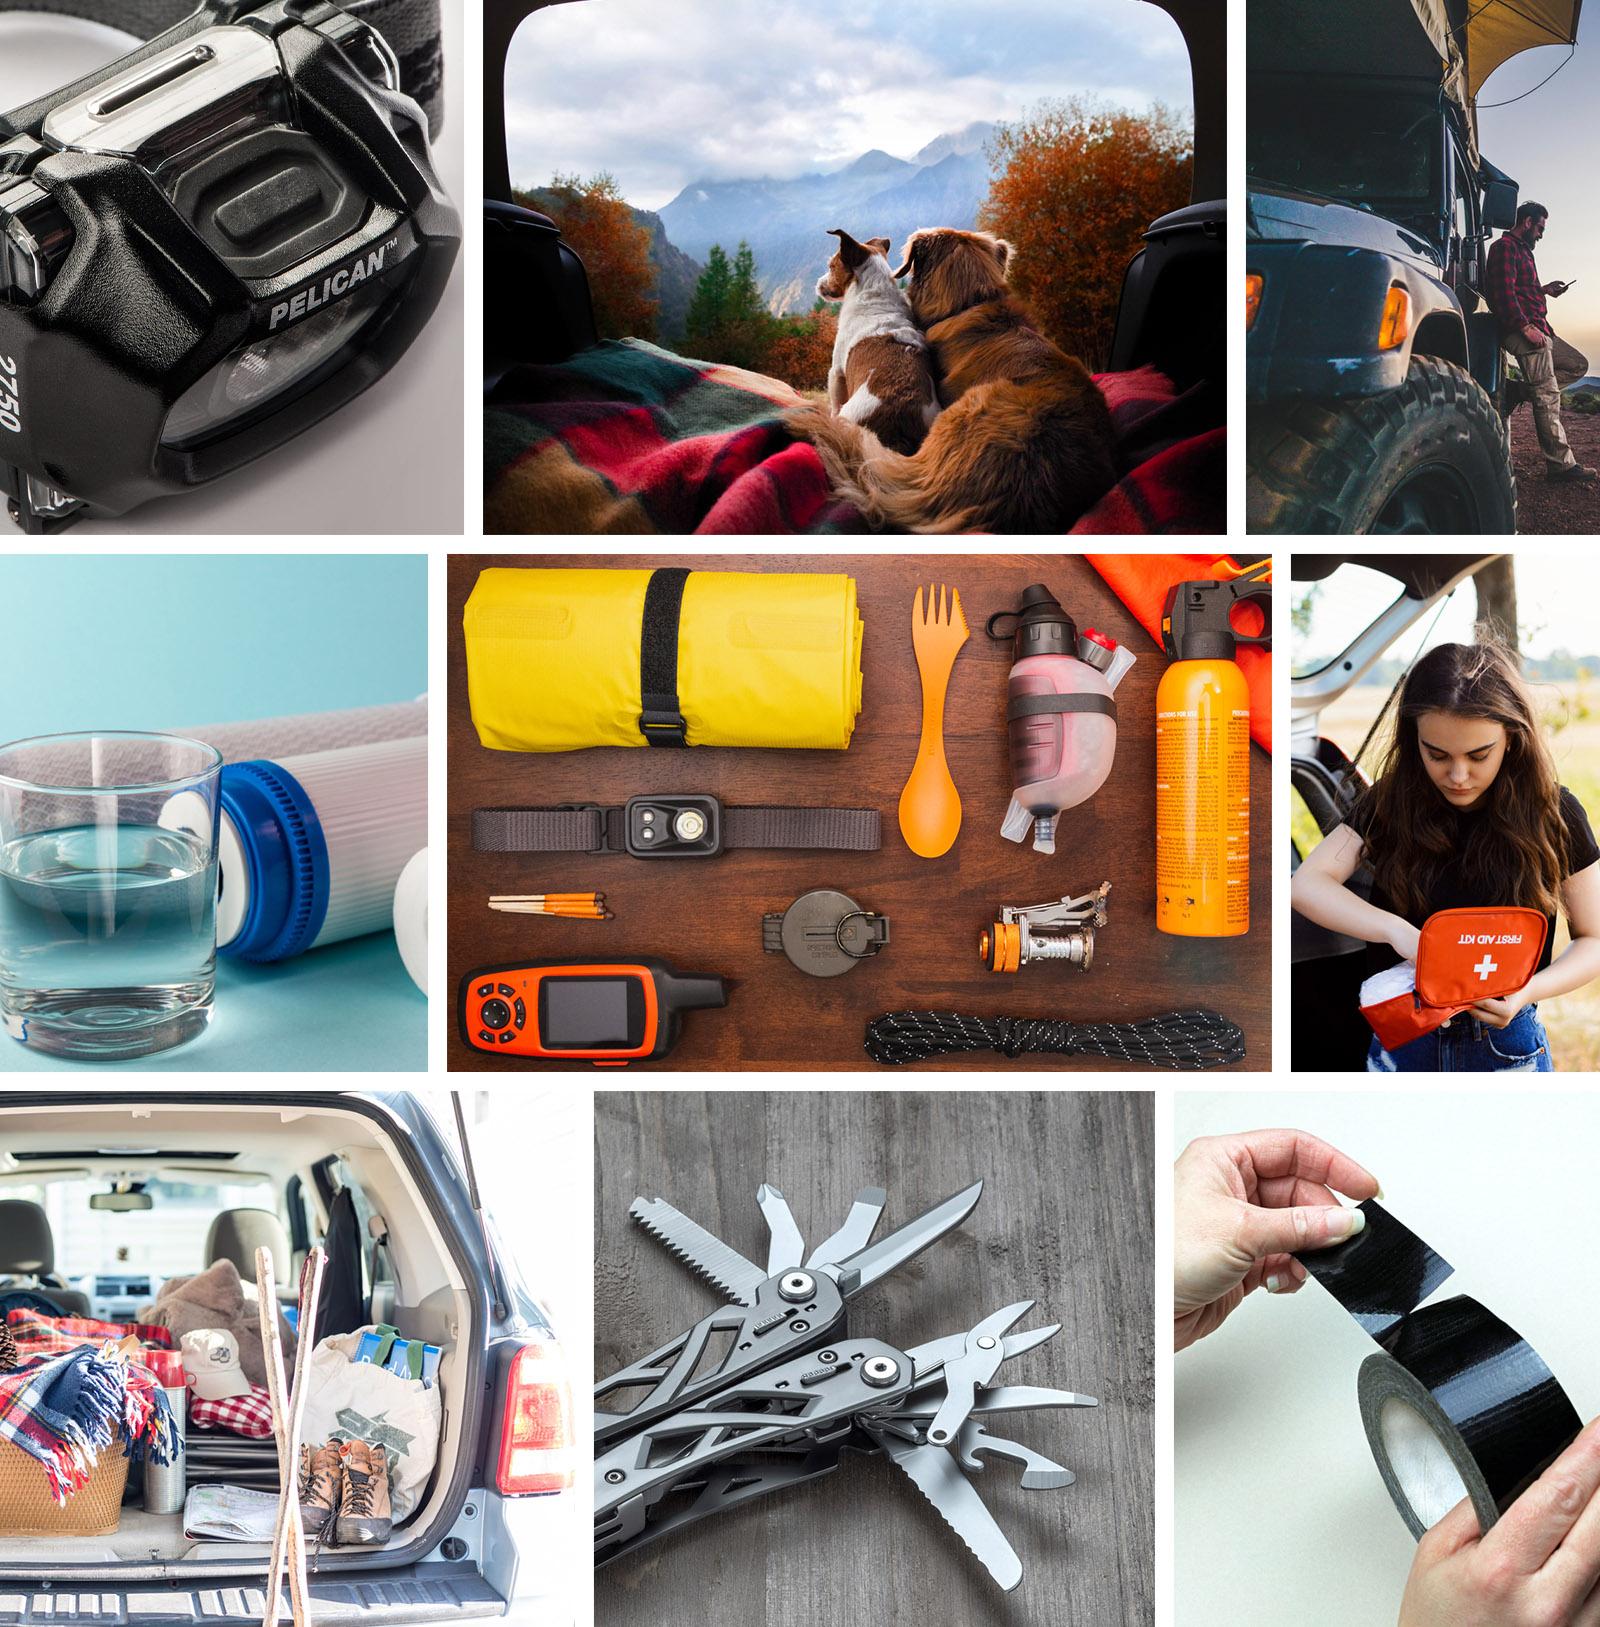 car camping gear bottles